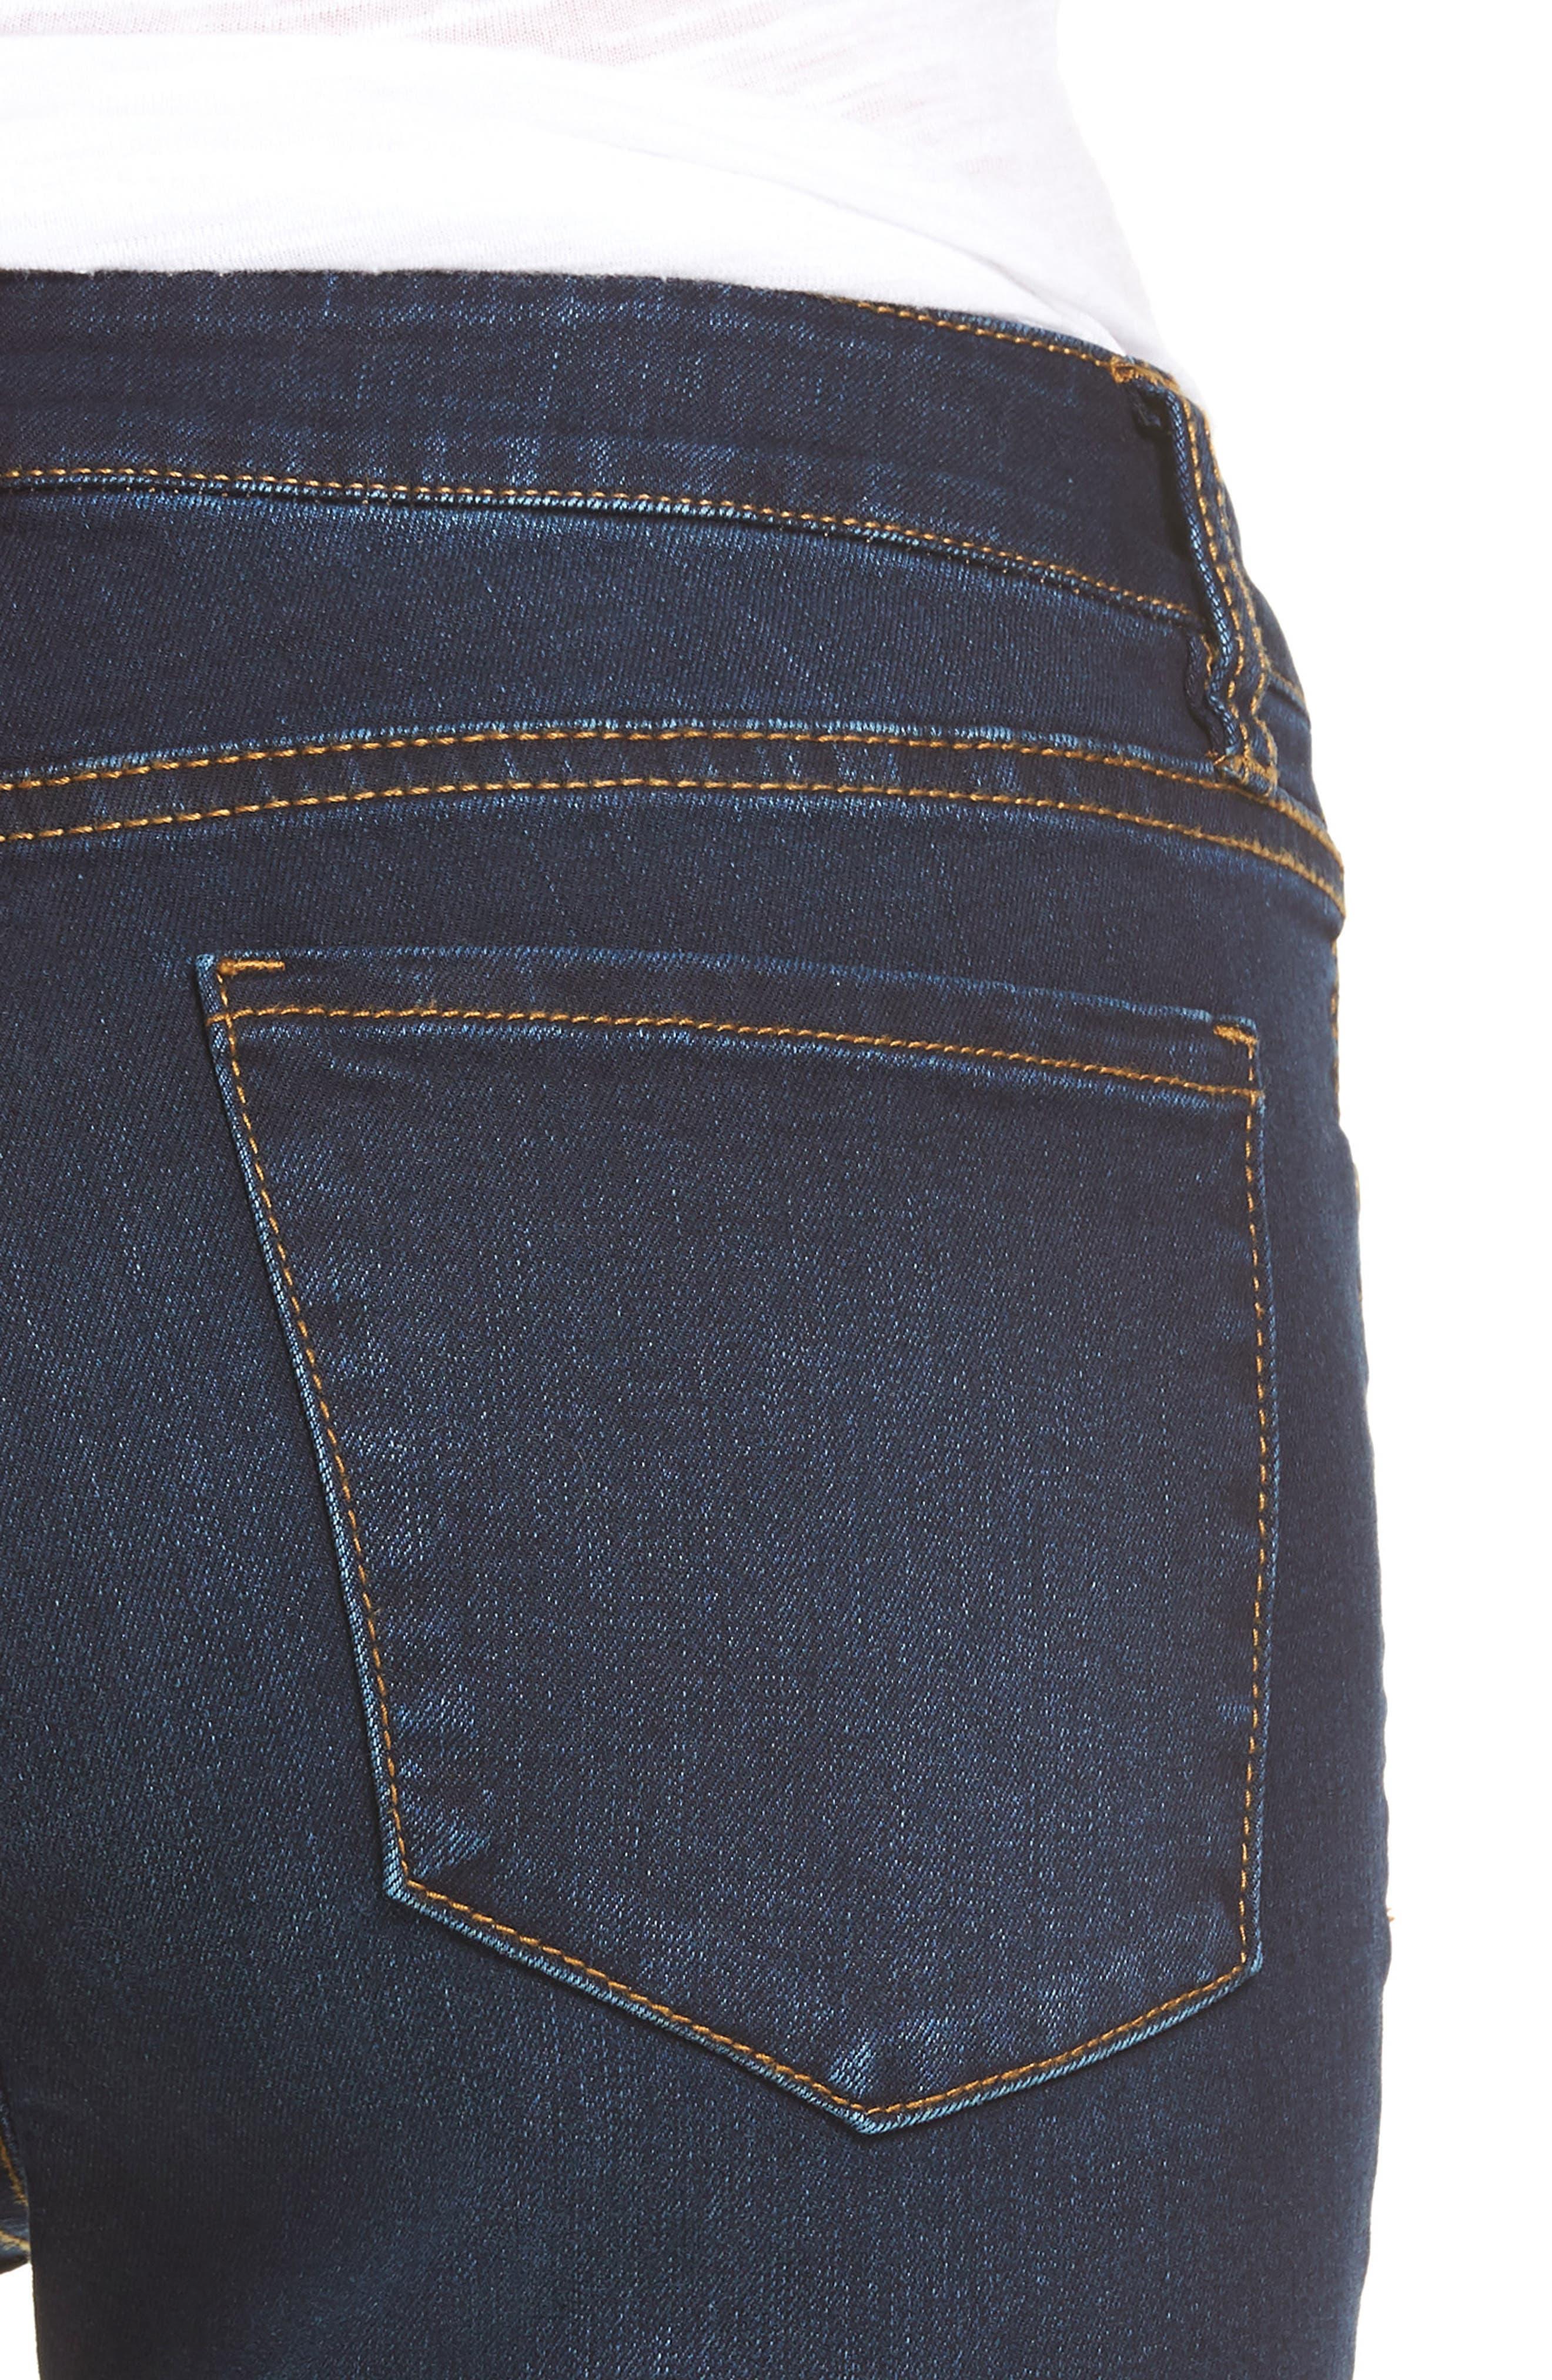 Ankle Skinny Jeans,                             Alternate thumbnail 4, color,                             404